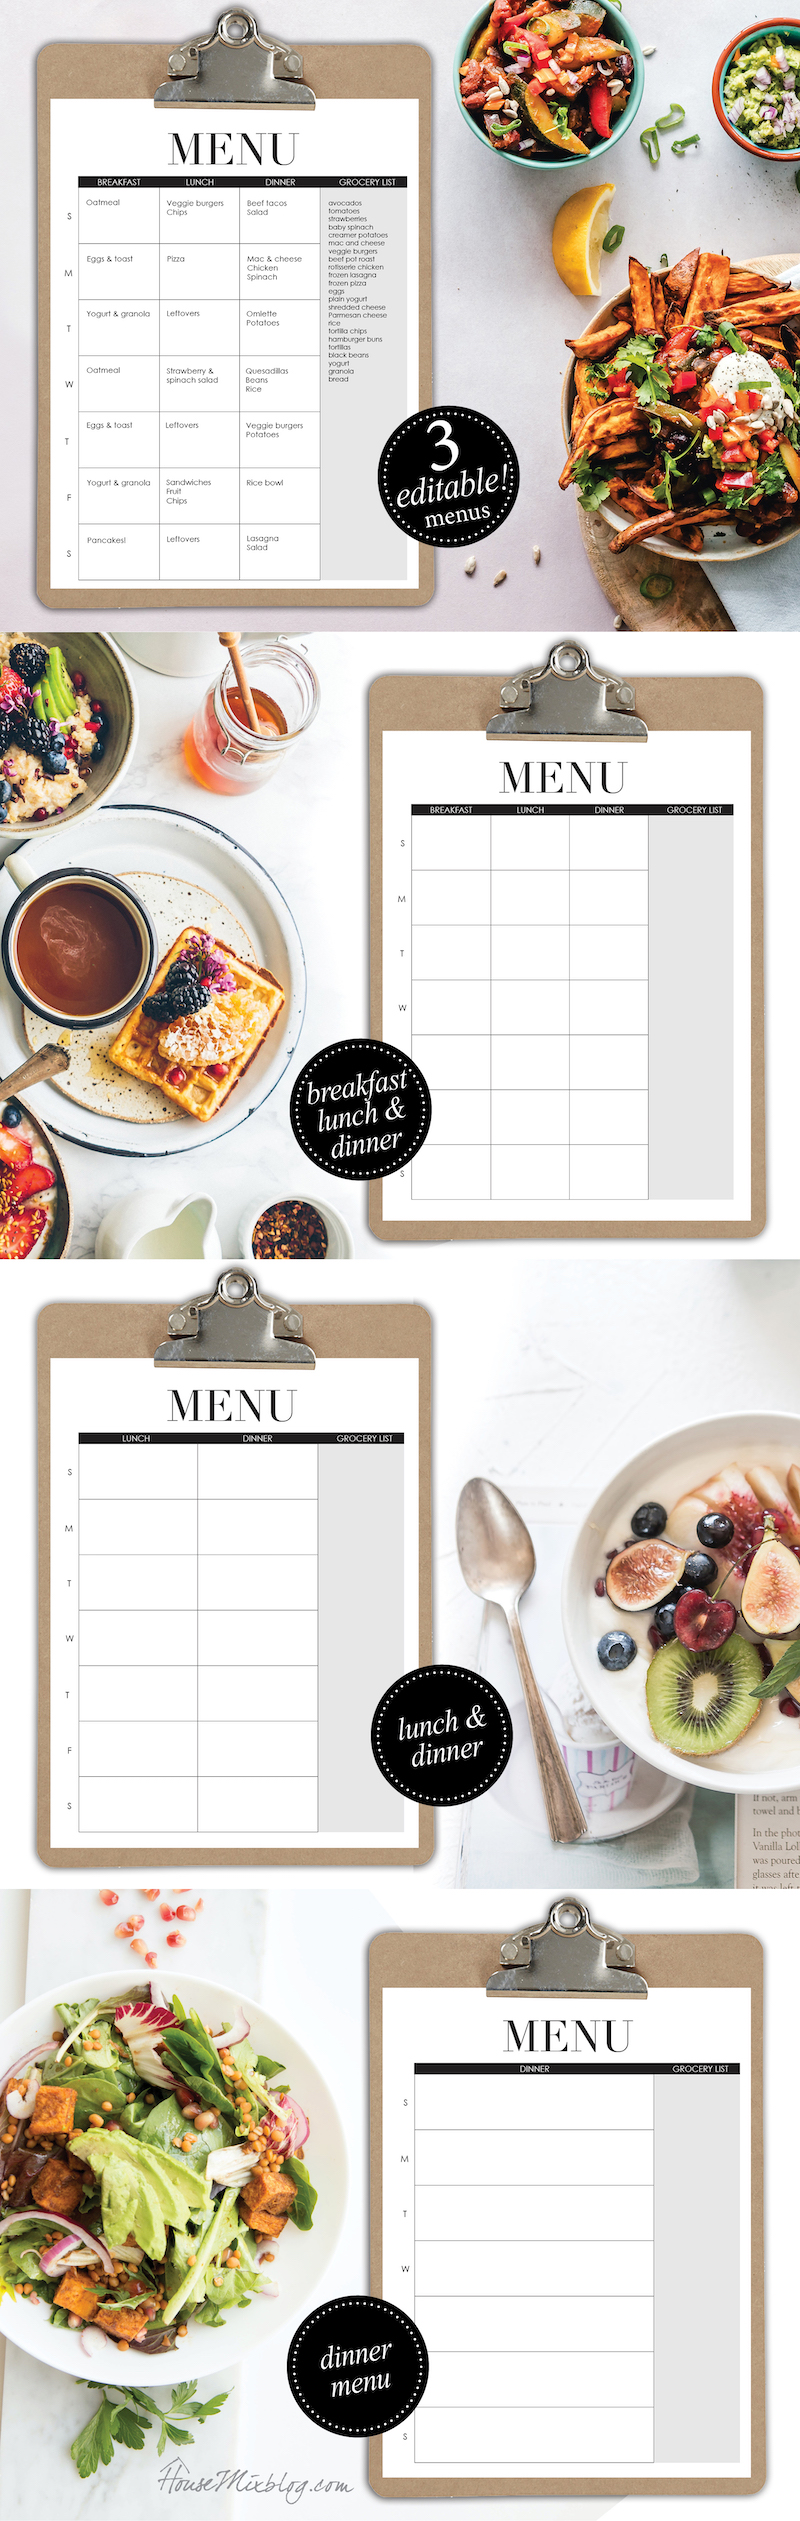 Editable menus - meal planner - breakfast lunch dinner - housemixblog.com